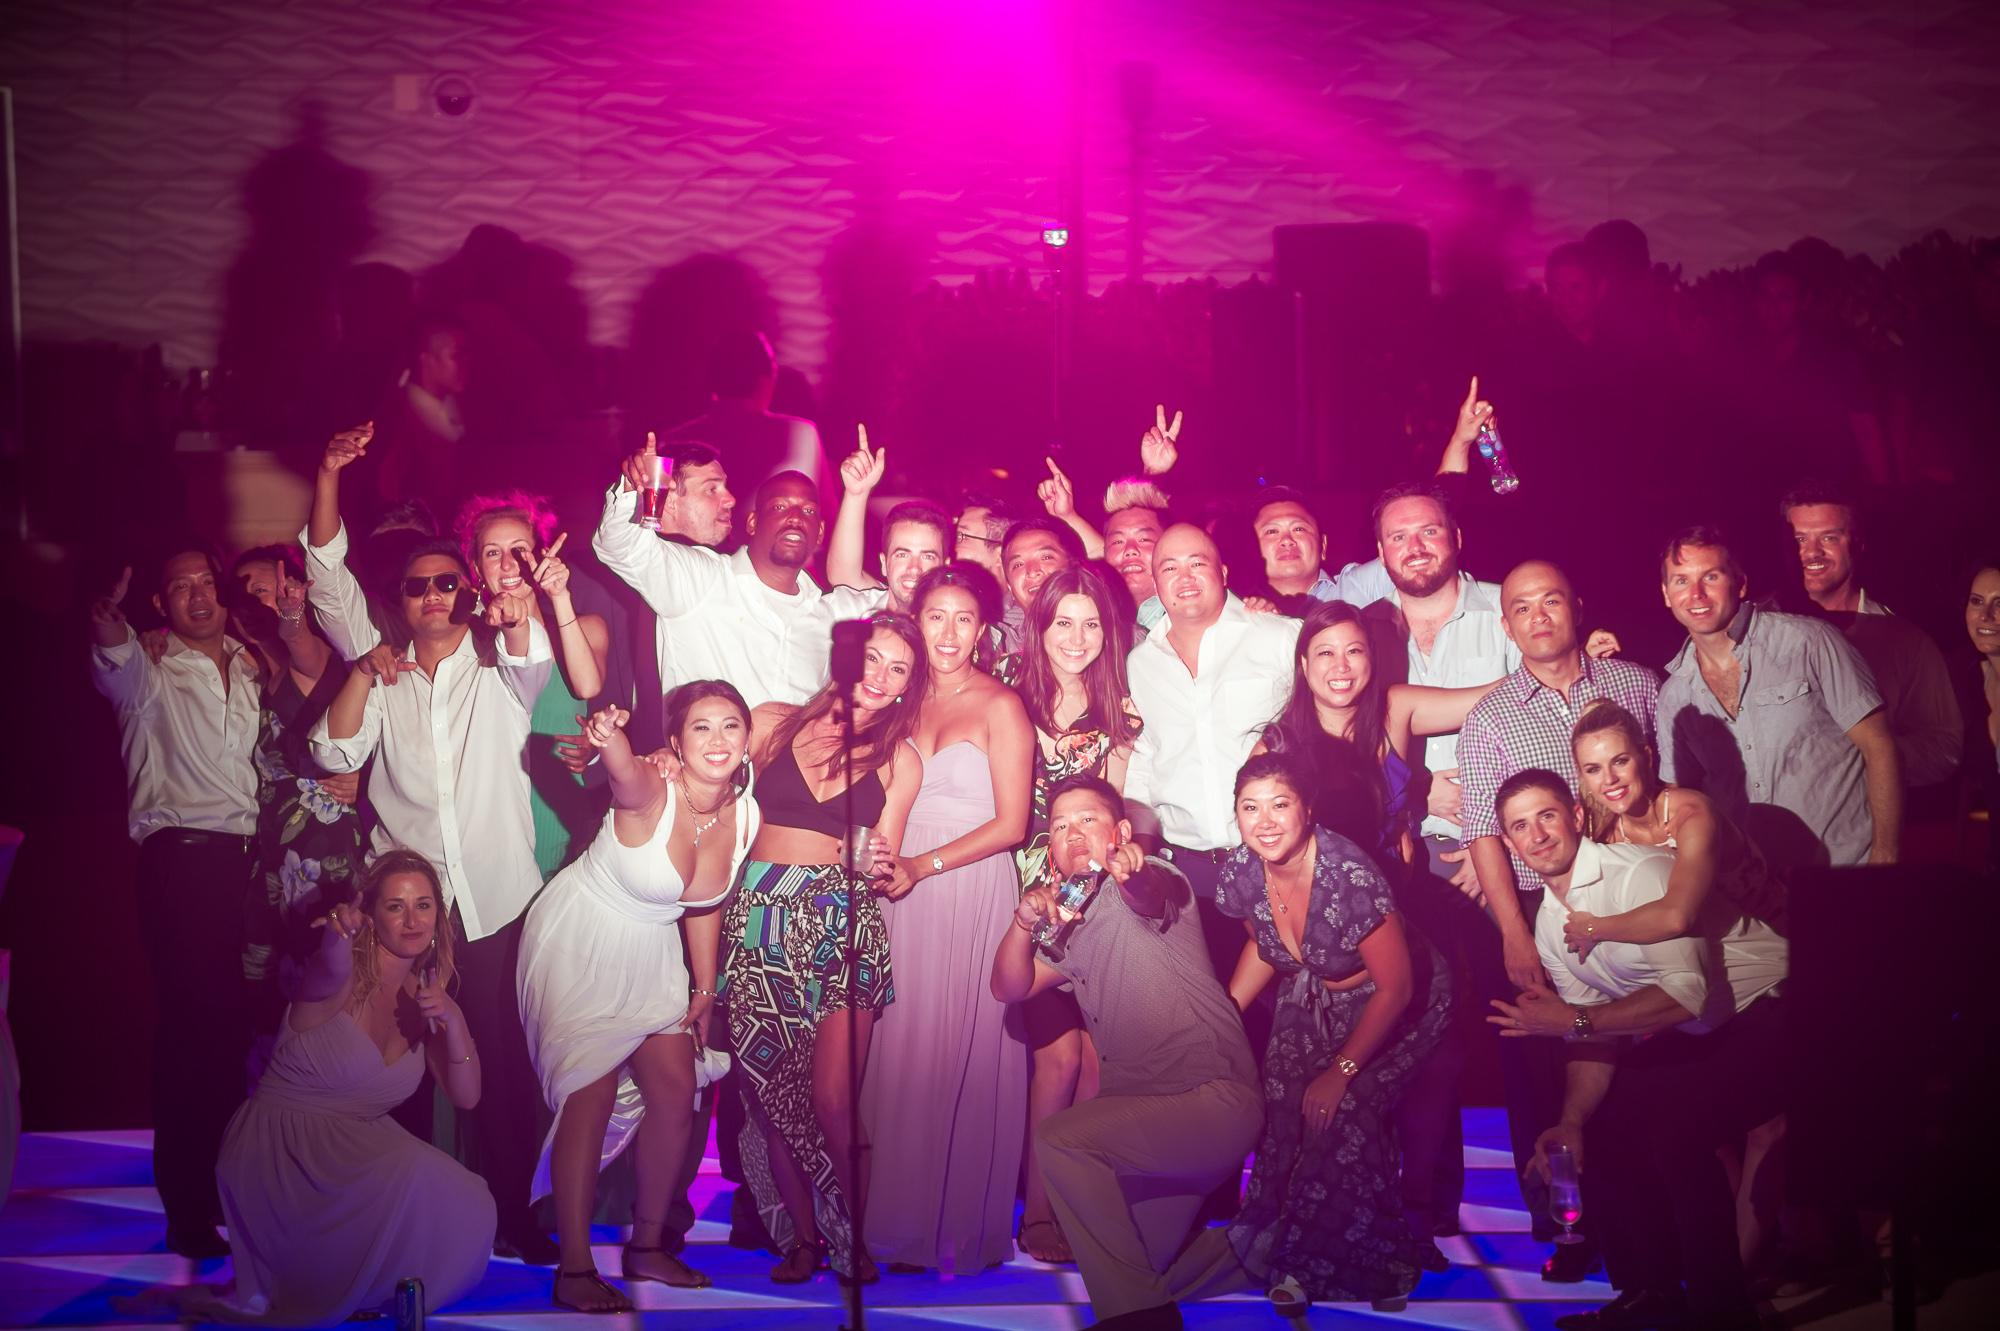 57-David Loi Studios - Cancun - Mexico - Destination Wedding-16305.jpg